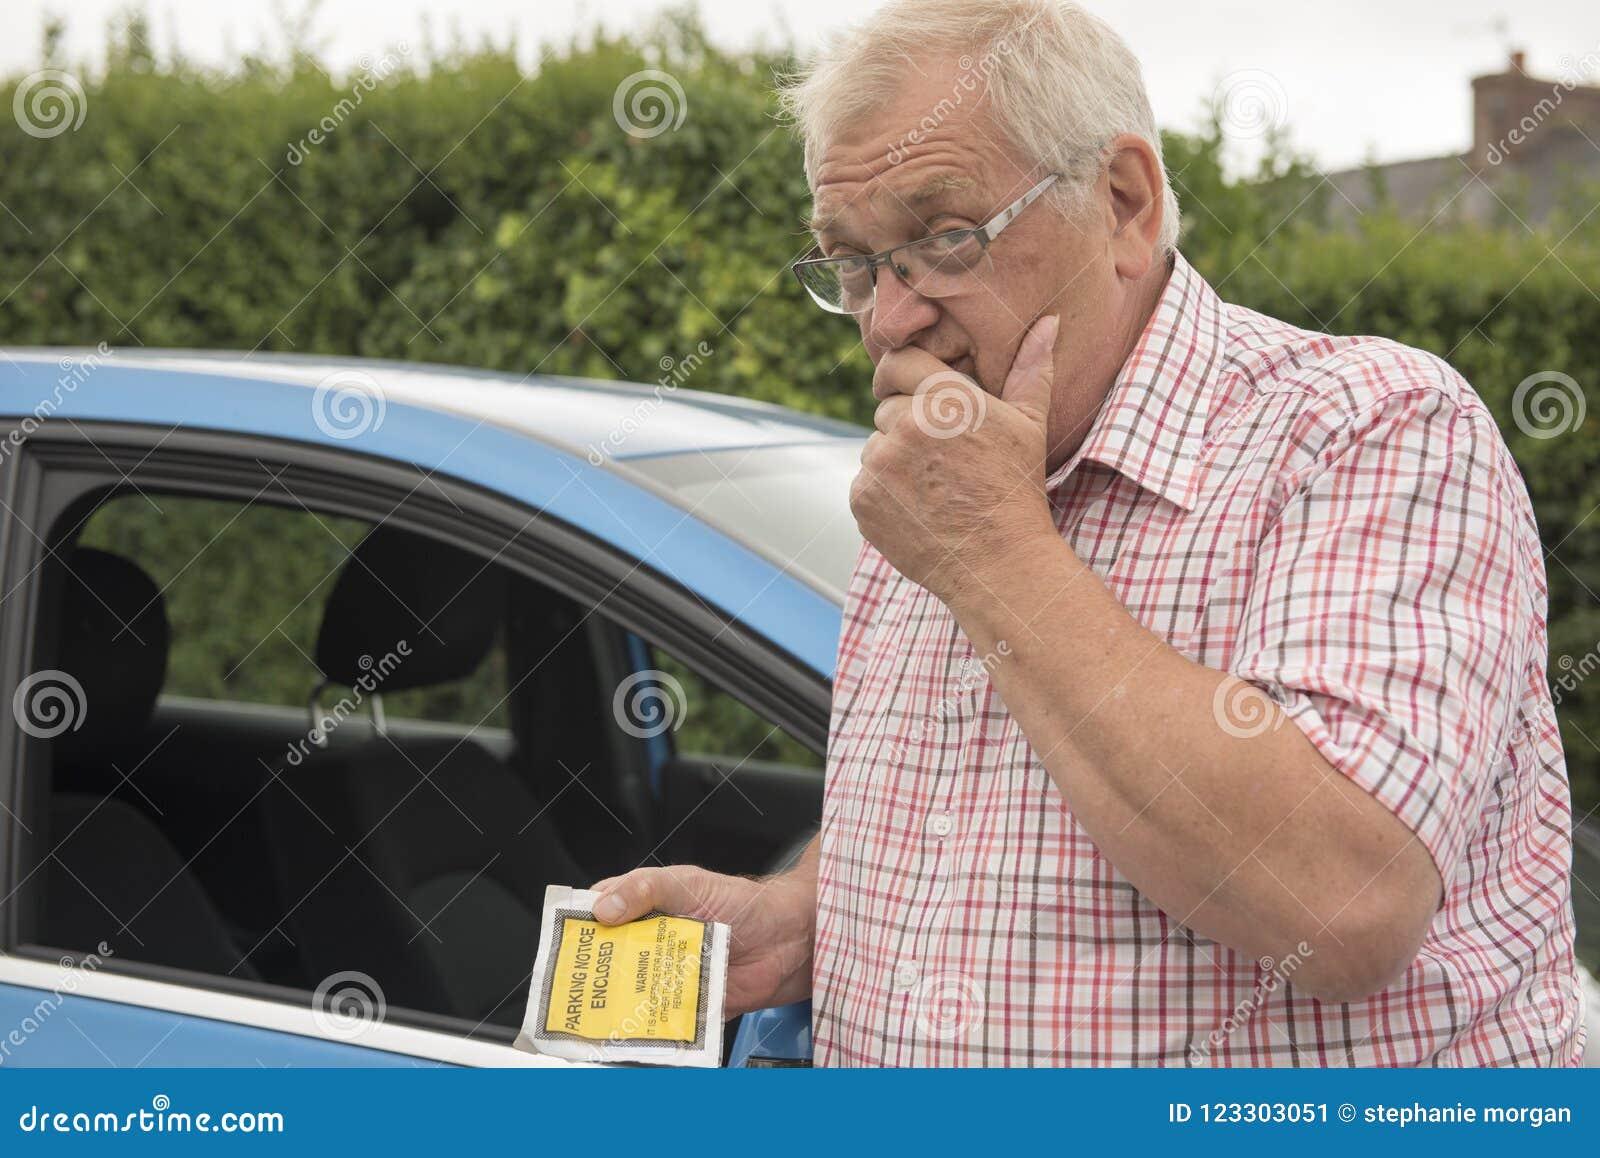 Hombre maduro con parquear parecer fino molestado